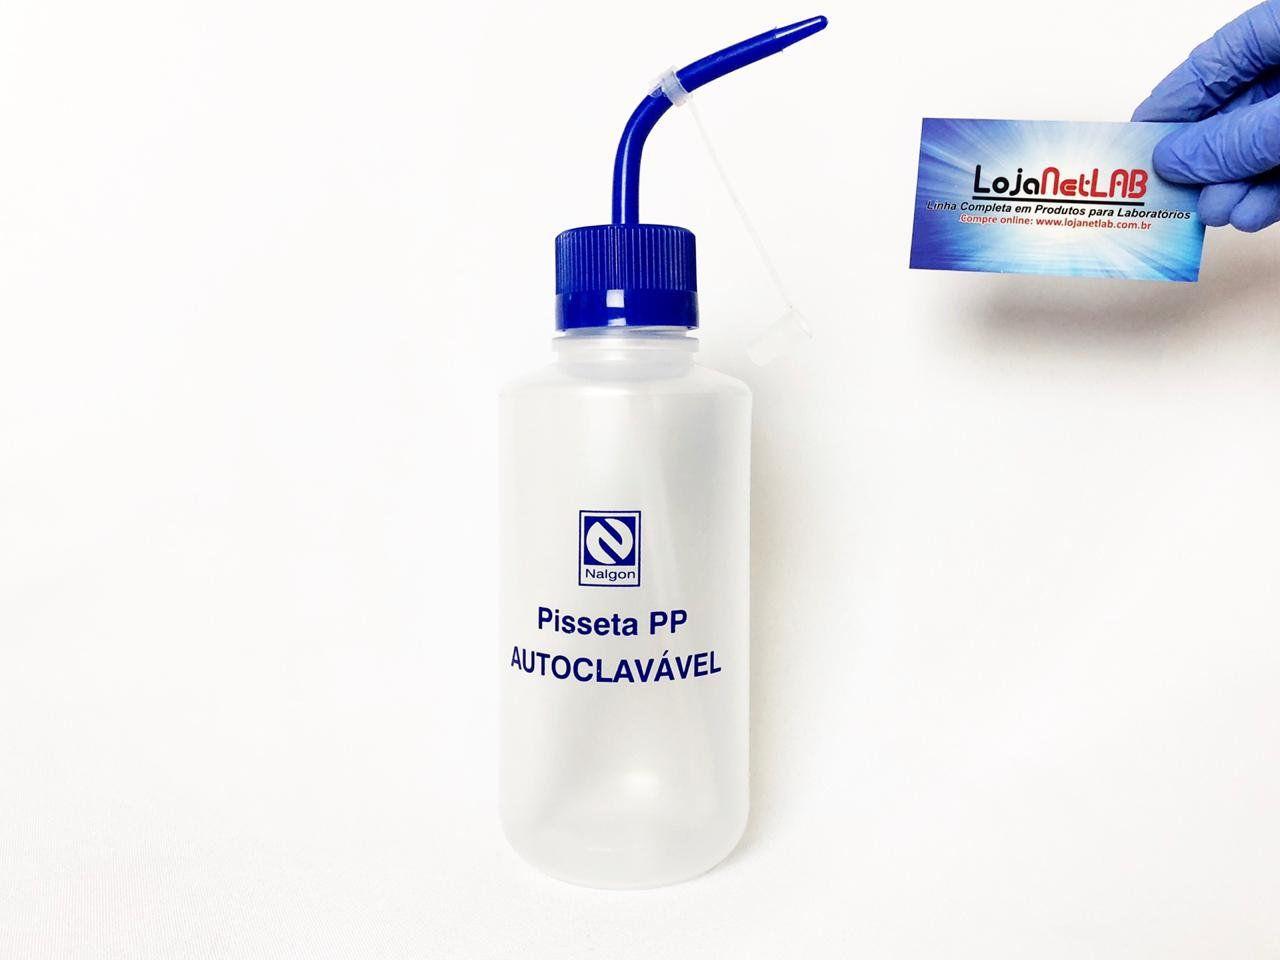 PISSETA (FRASCO LAVADOR) DE PLÁSTICO(PP) AUTOCLAVÁVEL 121°C  2230 NALGON